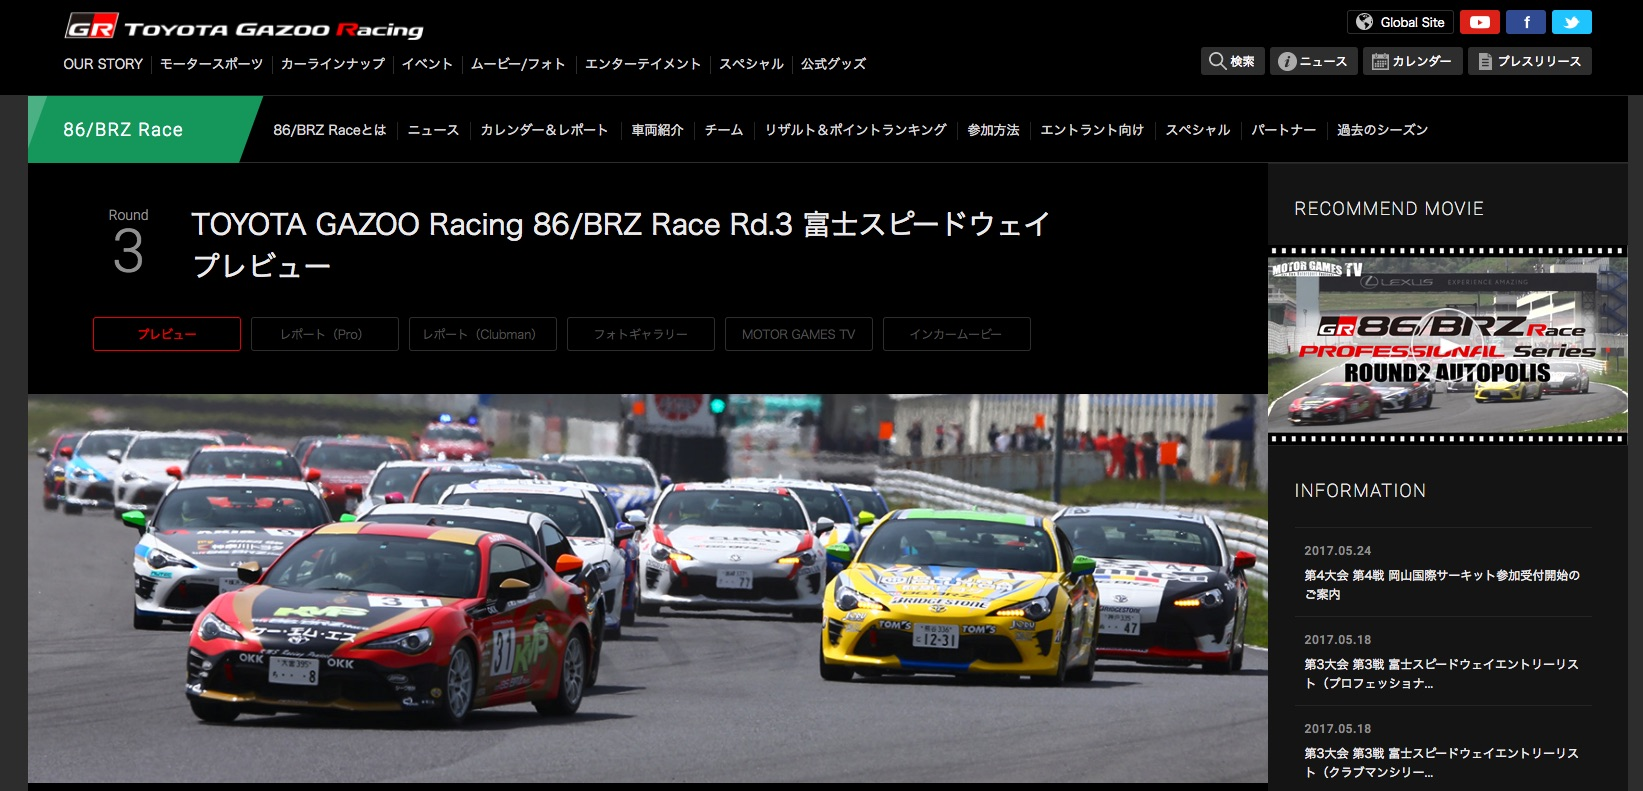 86 / BRZ Race Rd.3 Fuji Speedway / 2017.6.3 ~ 4